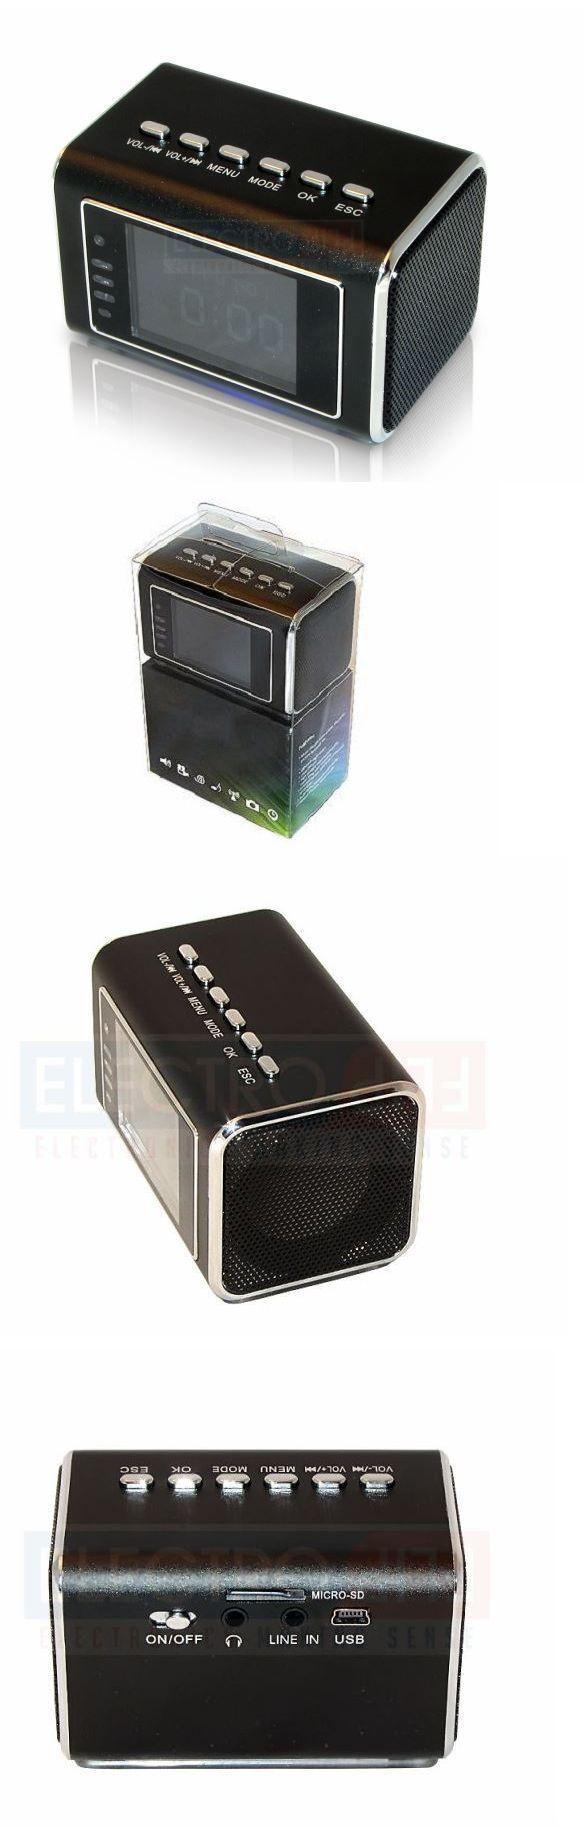 Surveillance Gadgets: Mini Hidden Spy Camera Clock Portable Dv Recorder 24Hr Surveillance Night Vision BUY IT NOW ONLY: $108.79